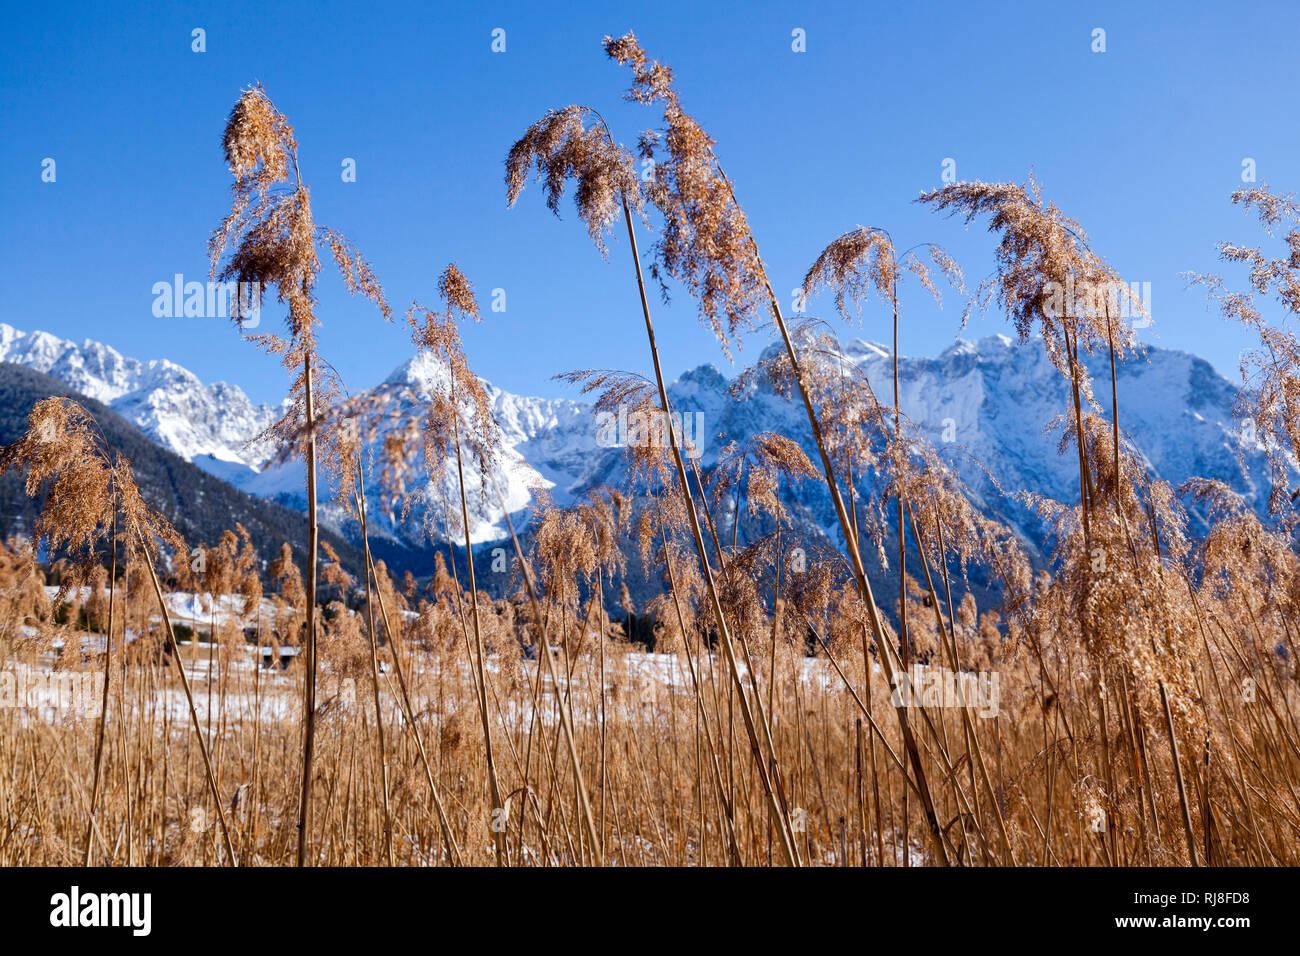 trockenes Schilfrohr am Bergsee Stock Photo